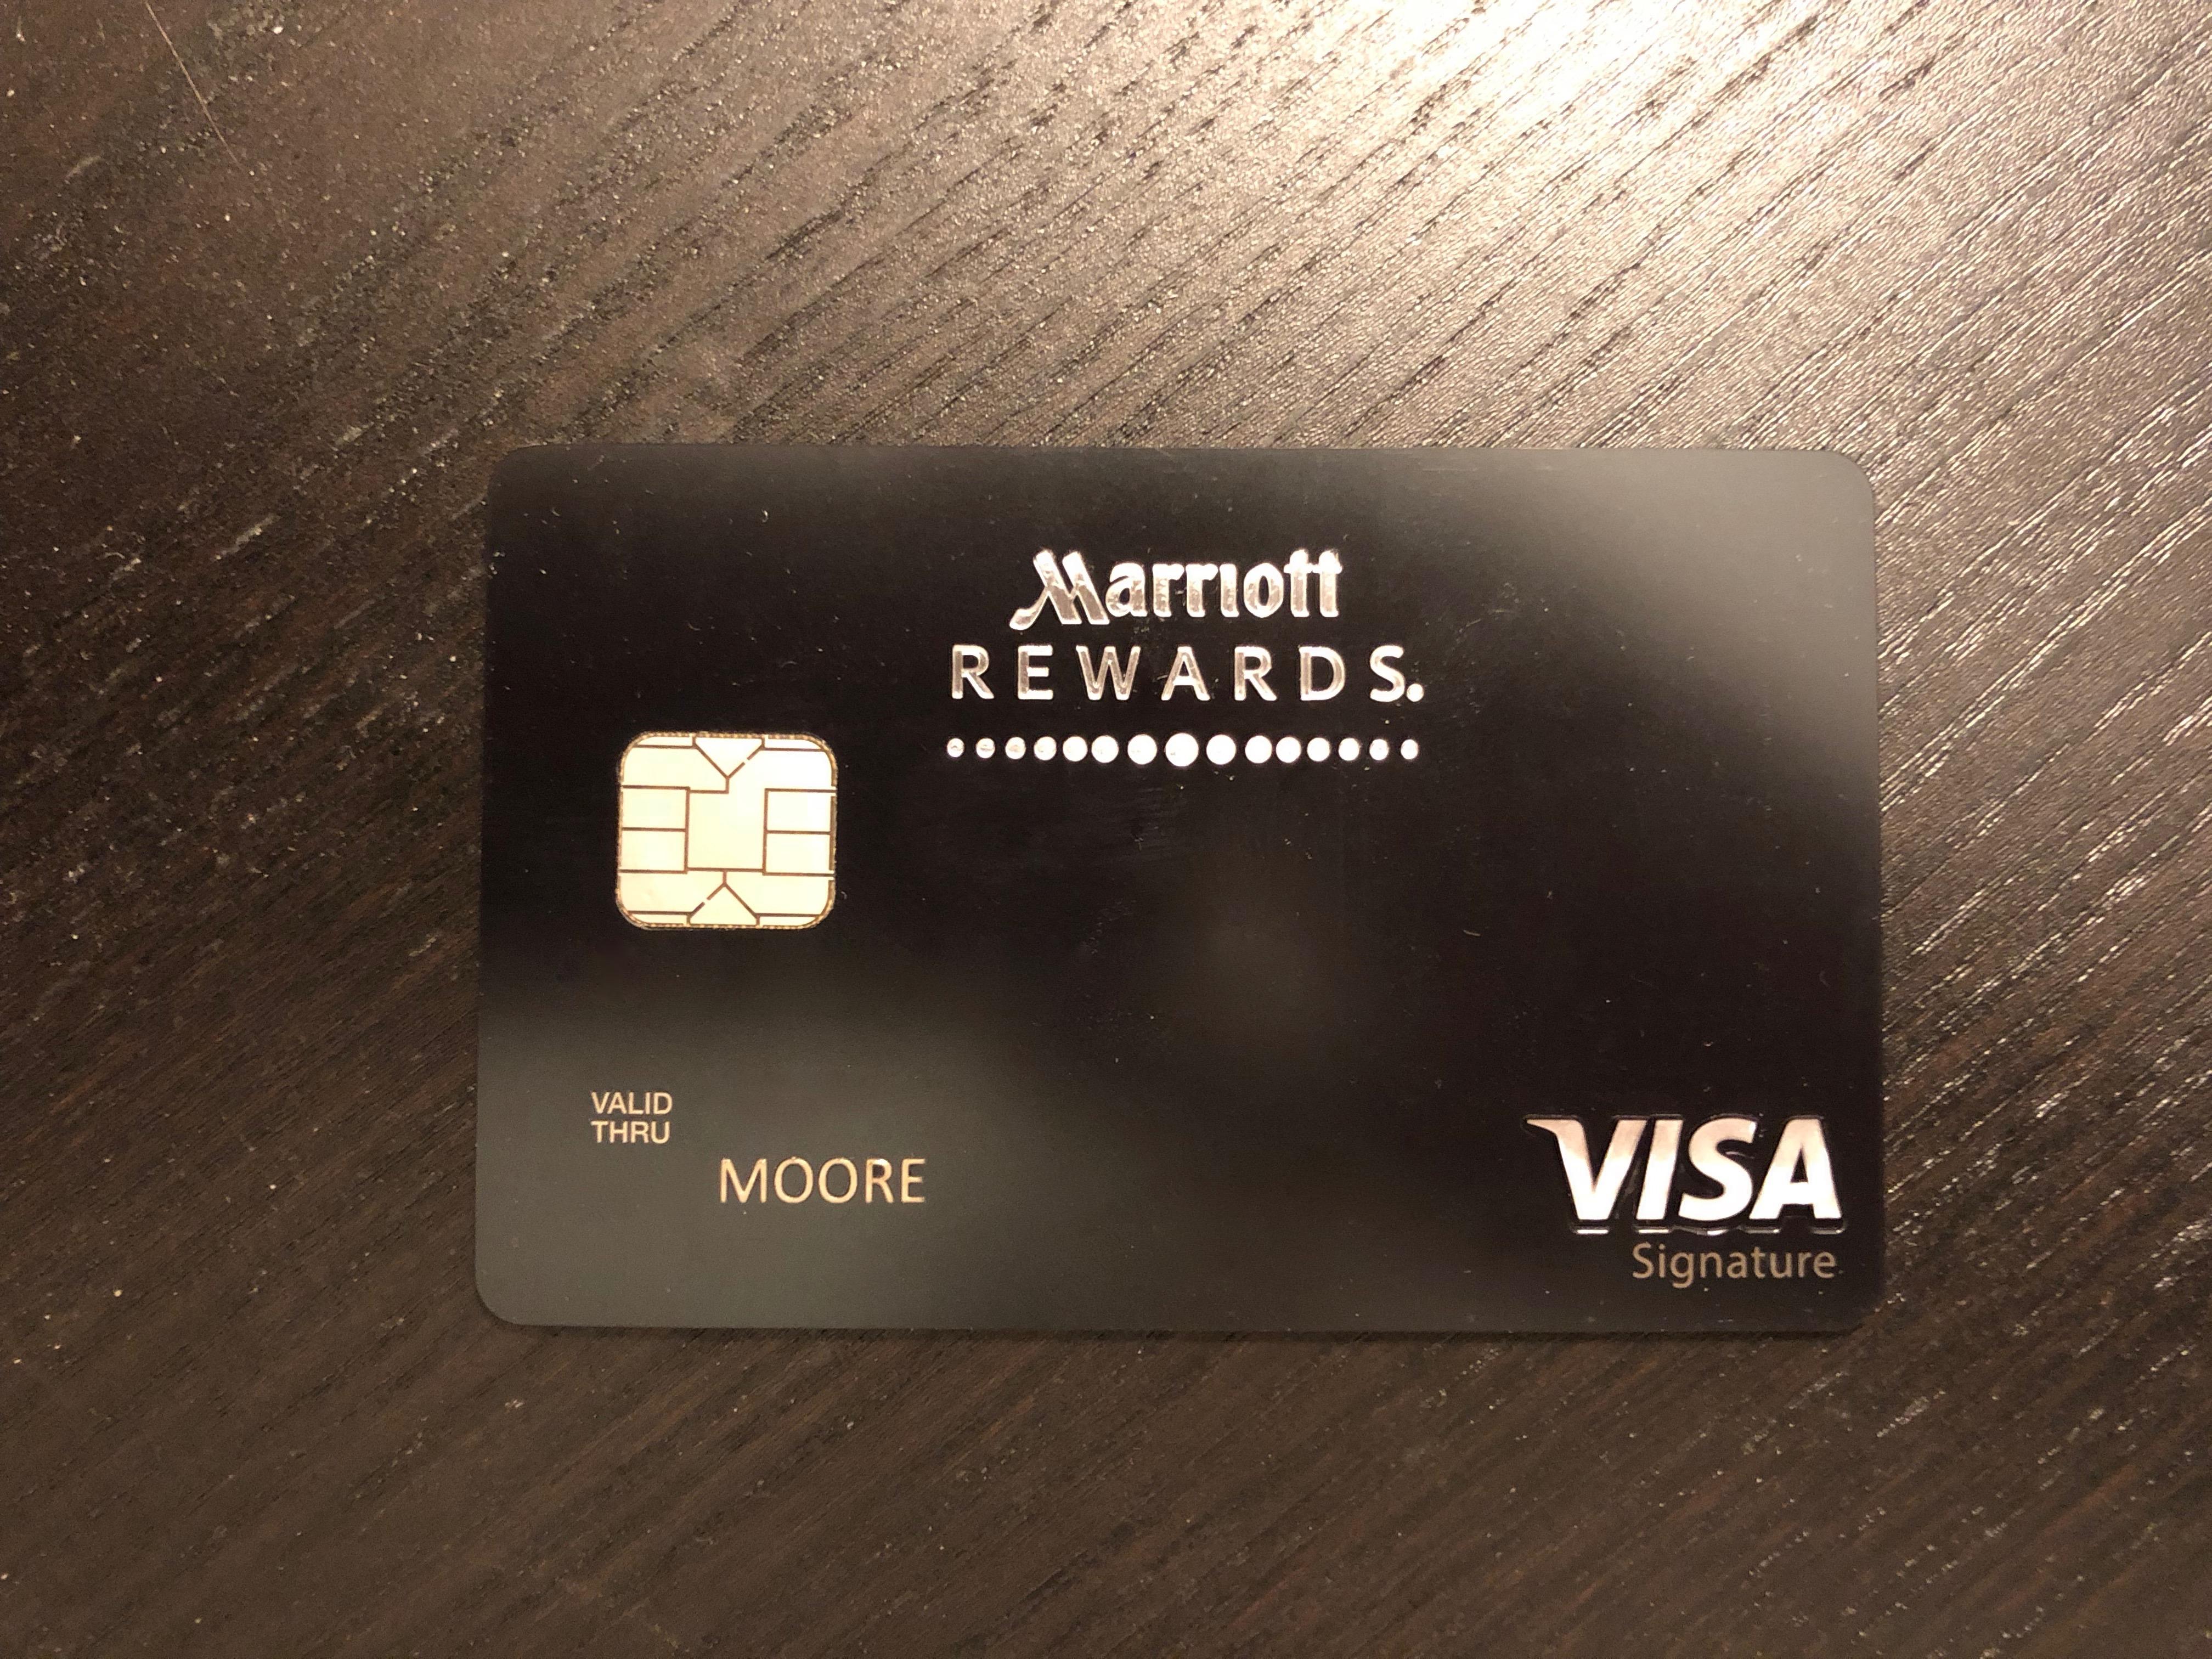 When Does The Marriott Rewards Premier Free Night Certificate Post ...